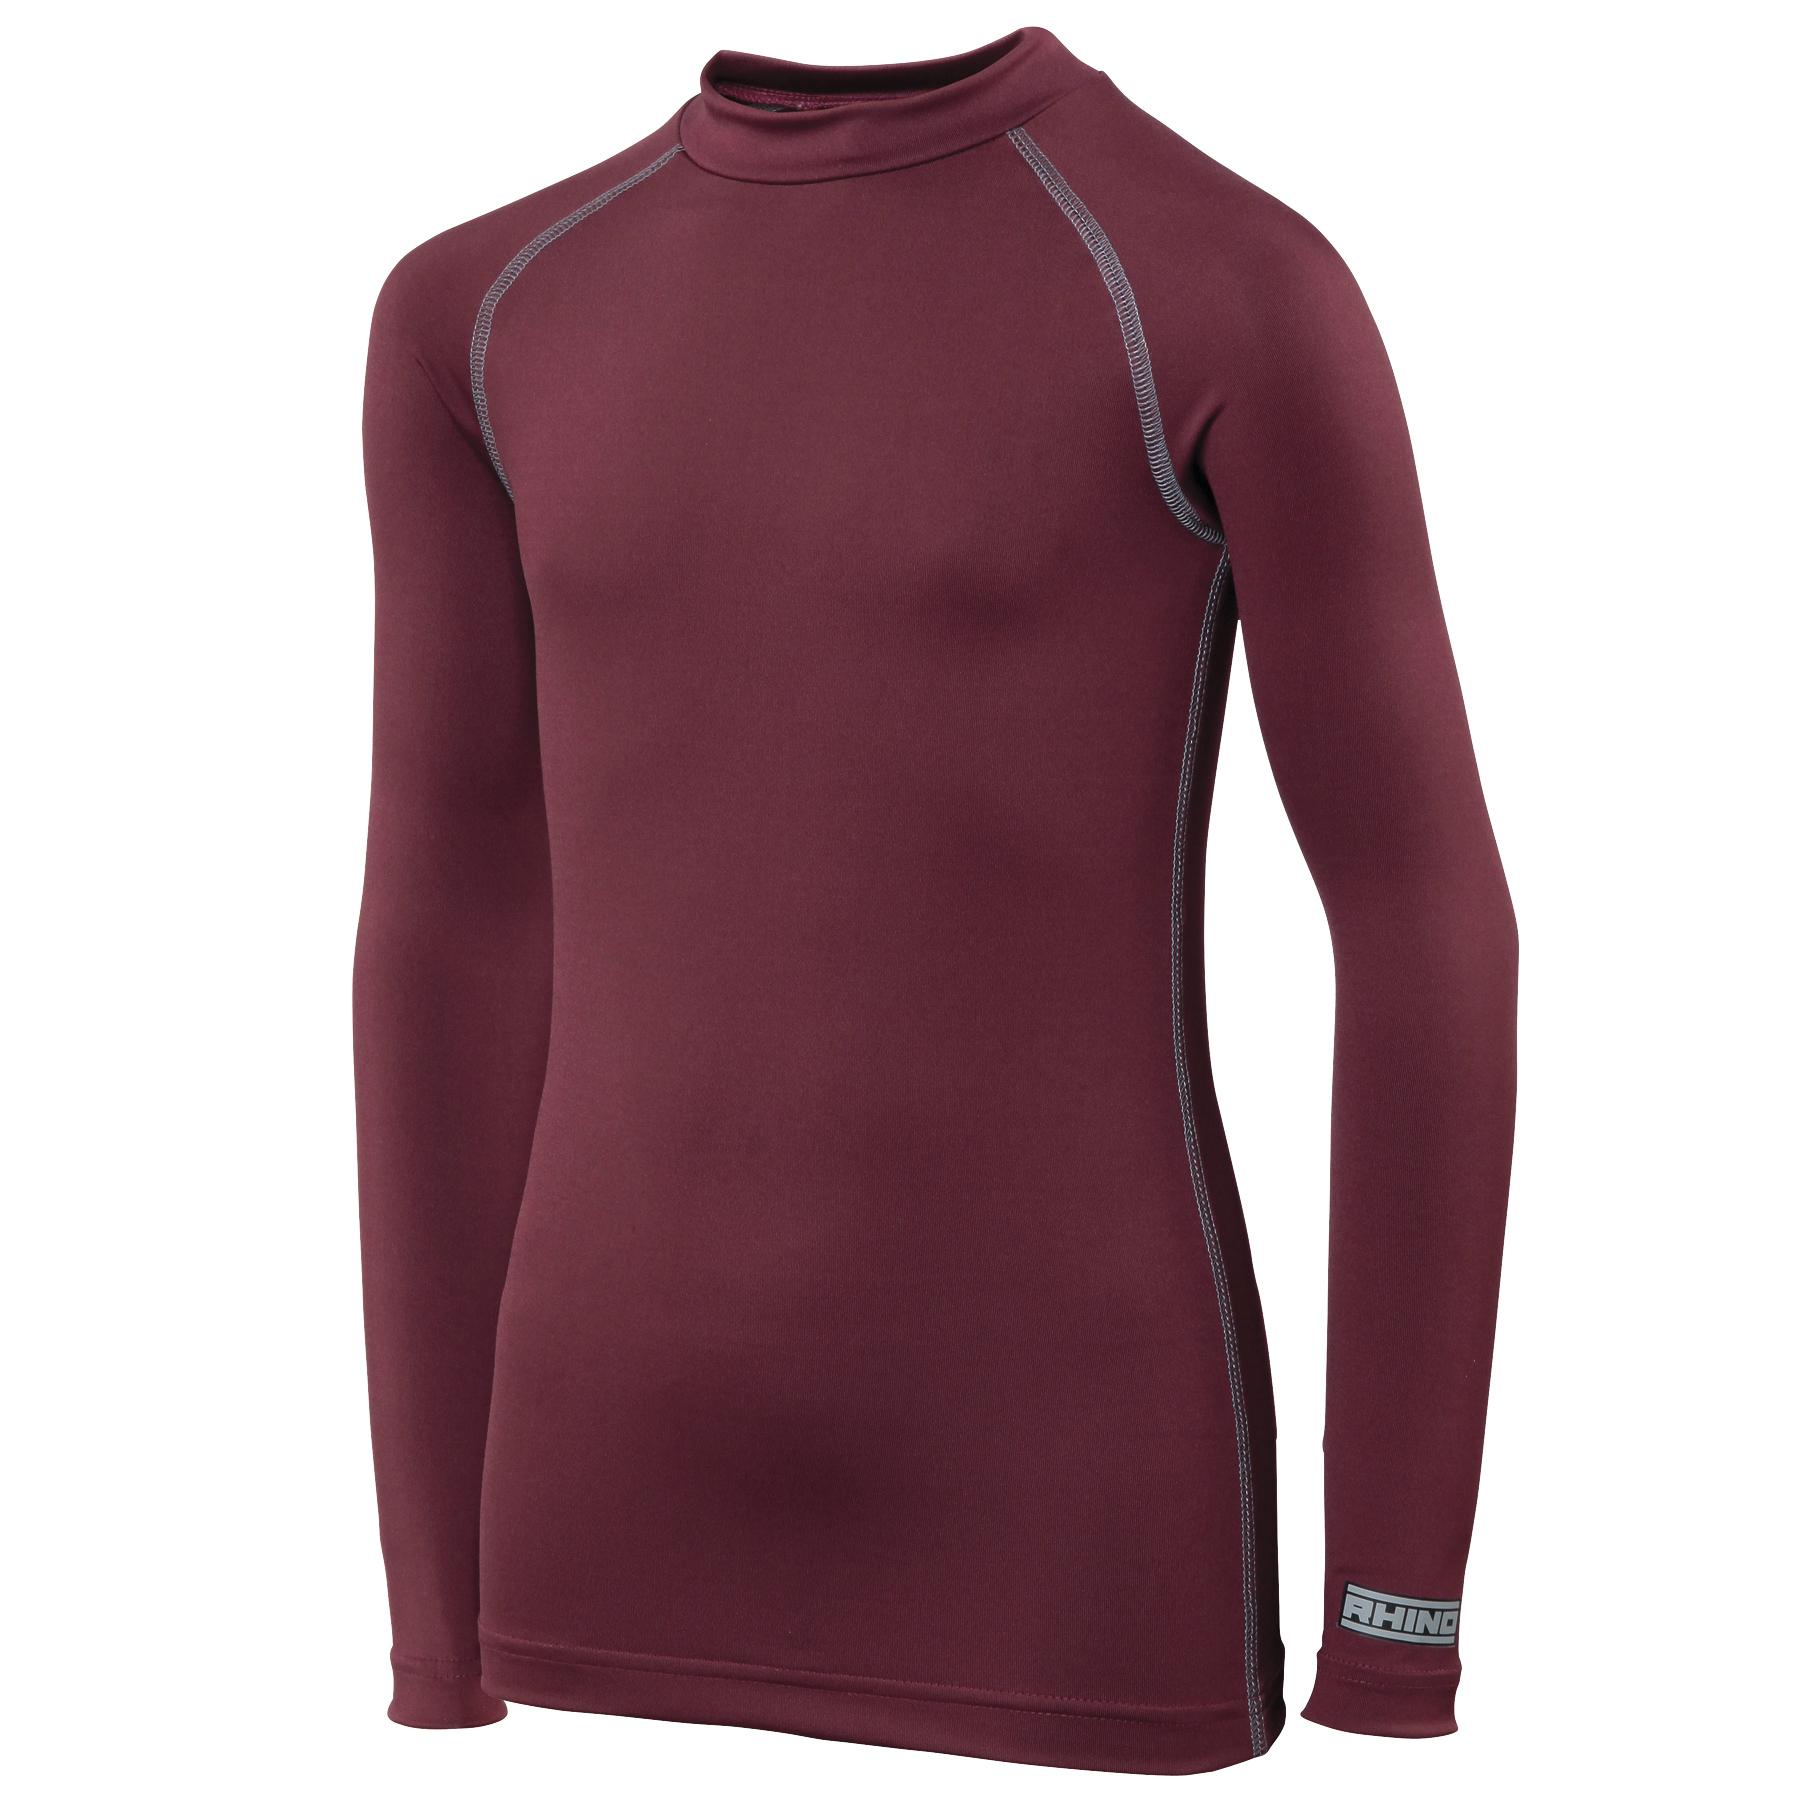 Rhino Childrens Boys Long Sleeve Thermal Underwear Base Layer Vest Top (XSY) (Maroon)